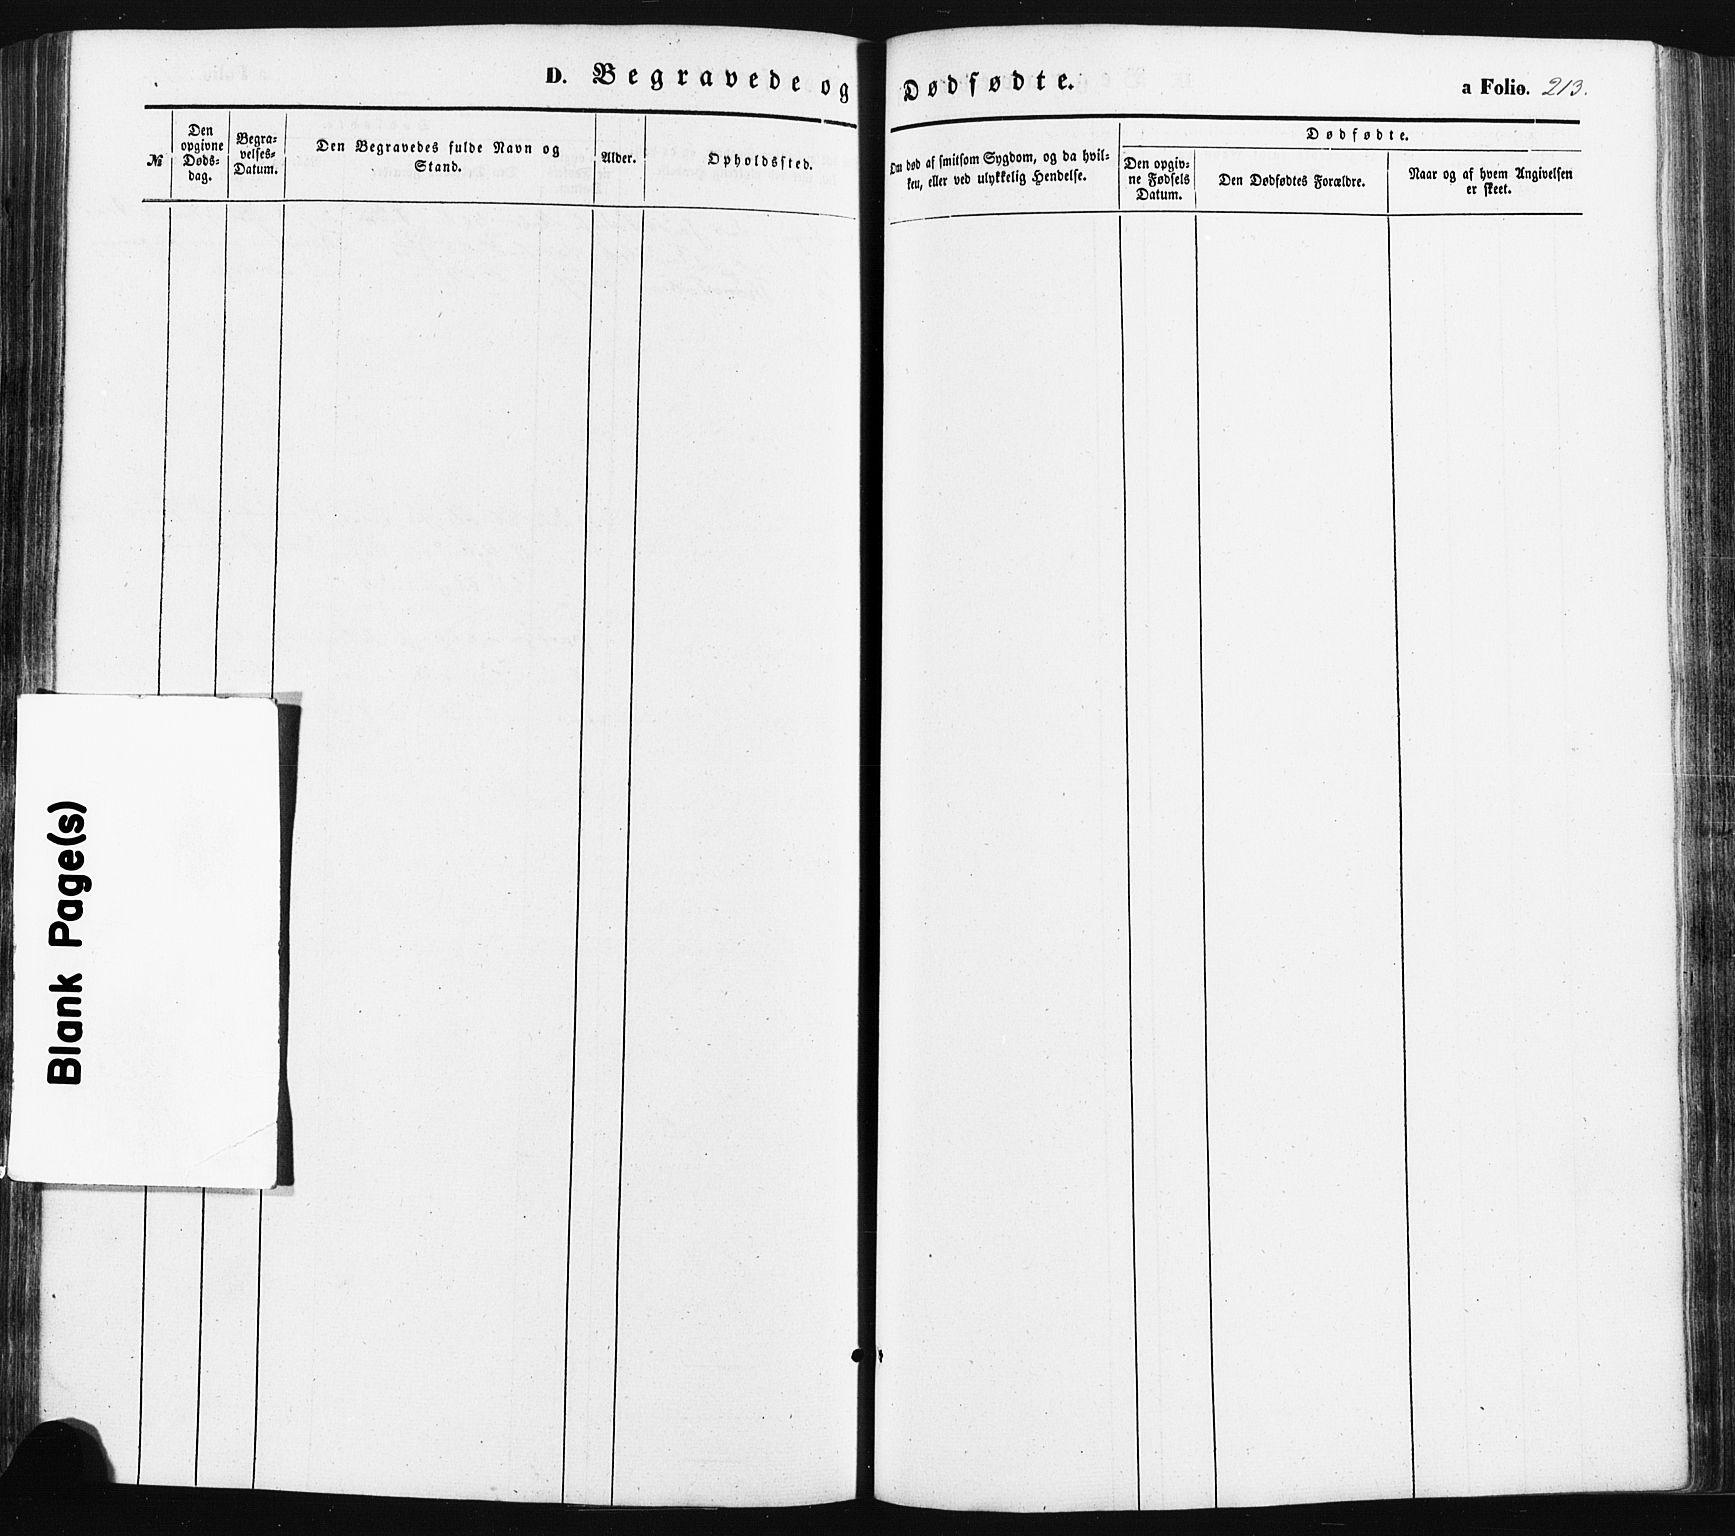 SAK, Oddernes sokneprestkontor, F/Fa/Faa/L0007: Ministerialbok nr. A 7, 1851-1863, s. 213